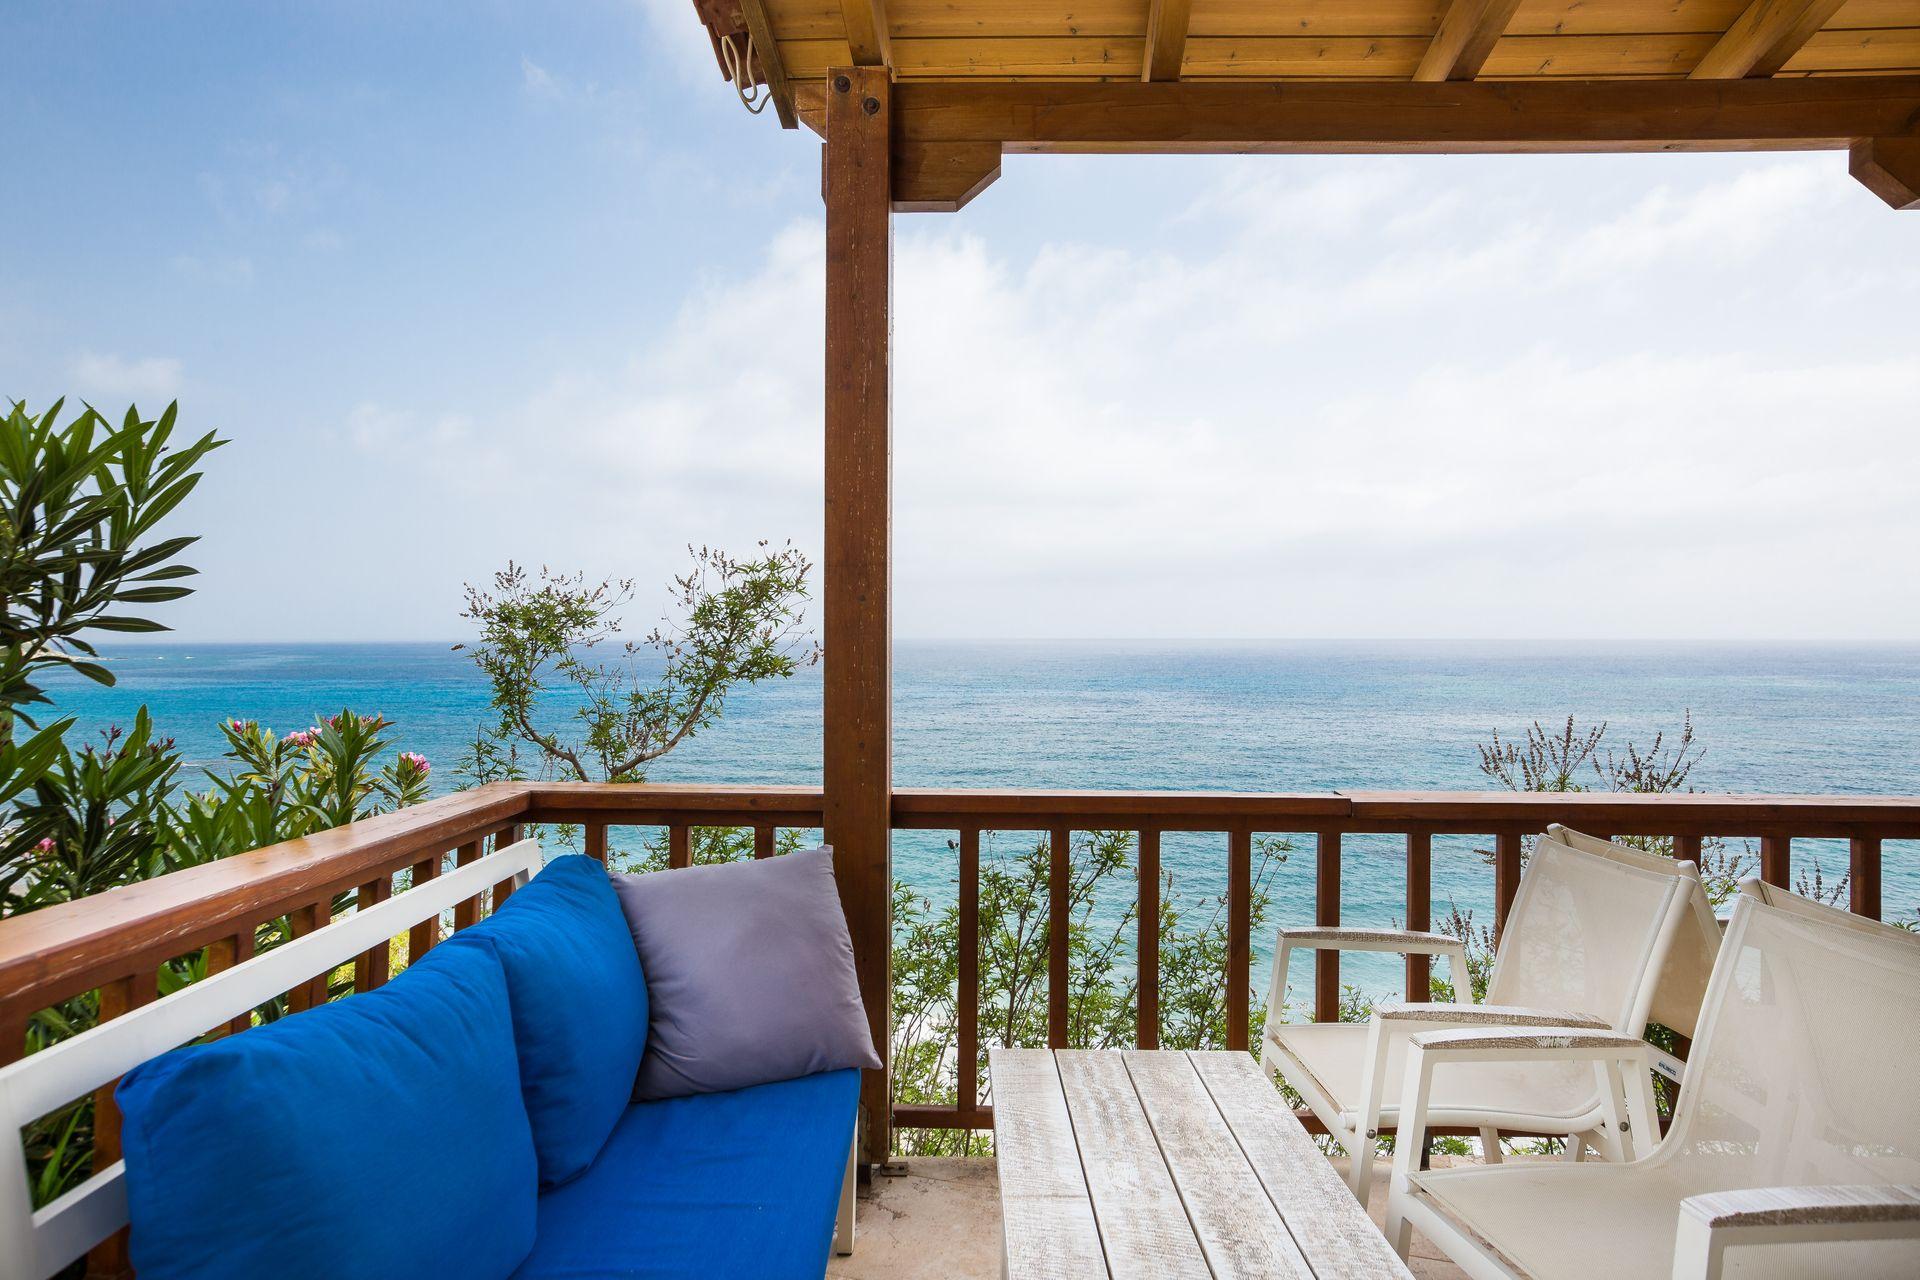 Fata Morgana - Χανιά, Κρήτη ✦ 11 Ημέρες (10 Διανυκτερεύσεις) ✦ 2 άτομα ✦ Χωρίς Πρωινό ✦ 01/07/2020 έως 30/09/2020 ✦ Μπροστά στην Παραλία!